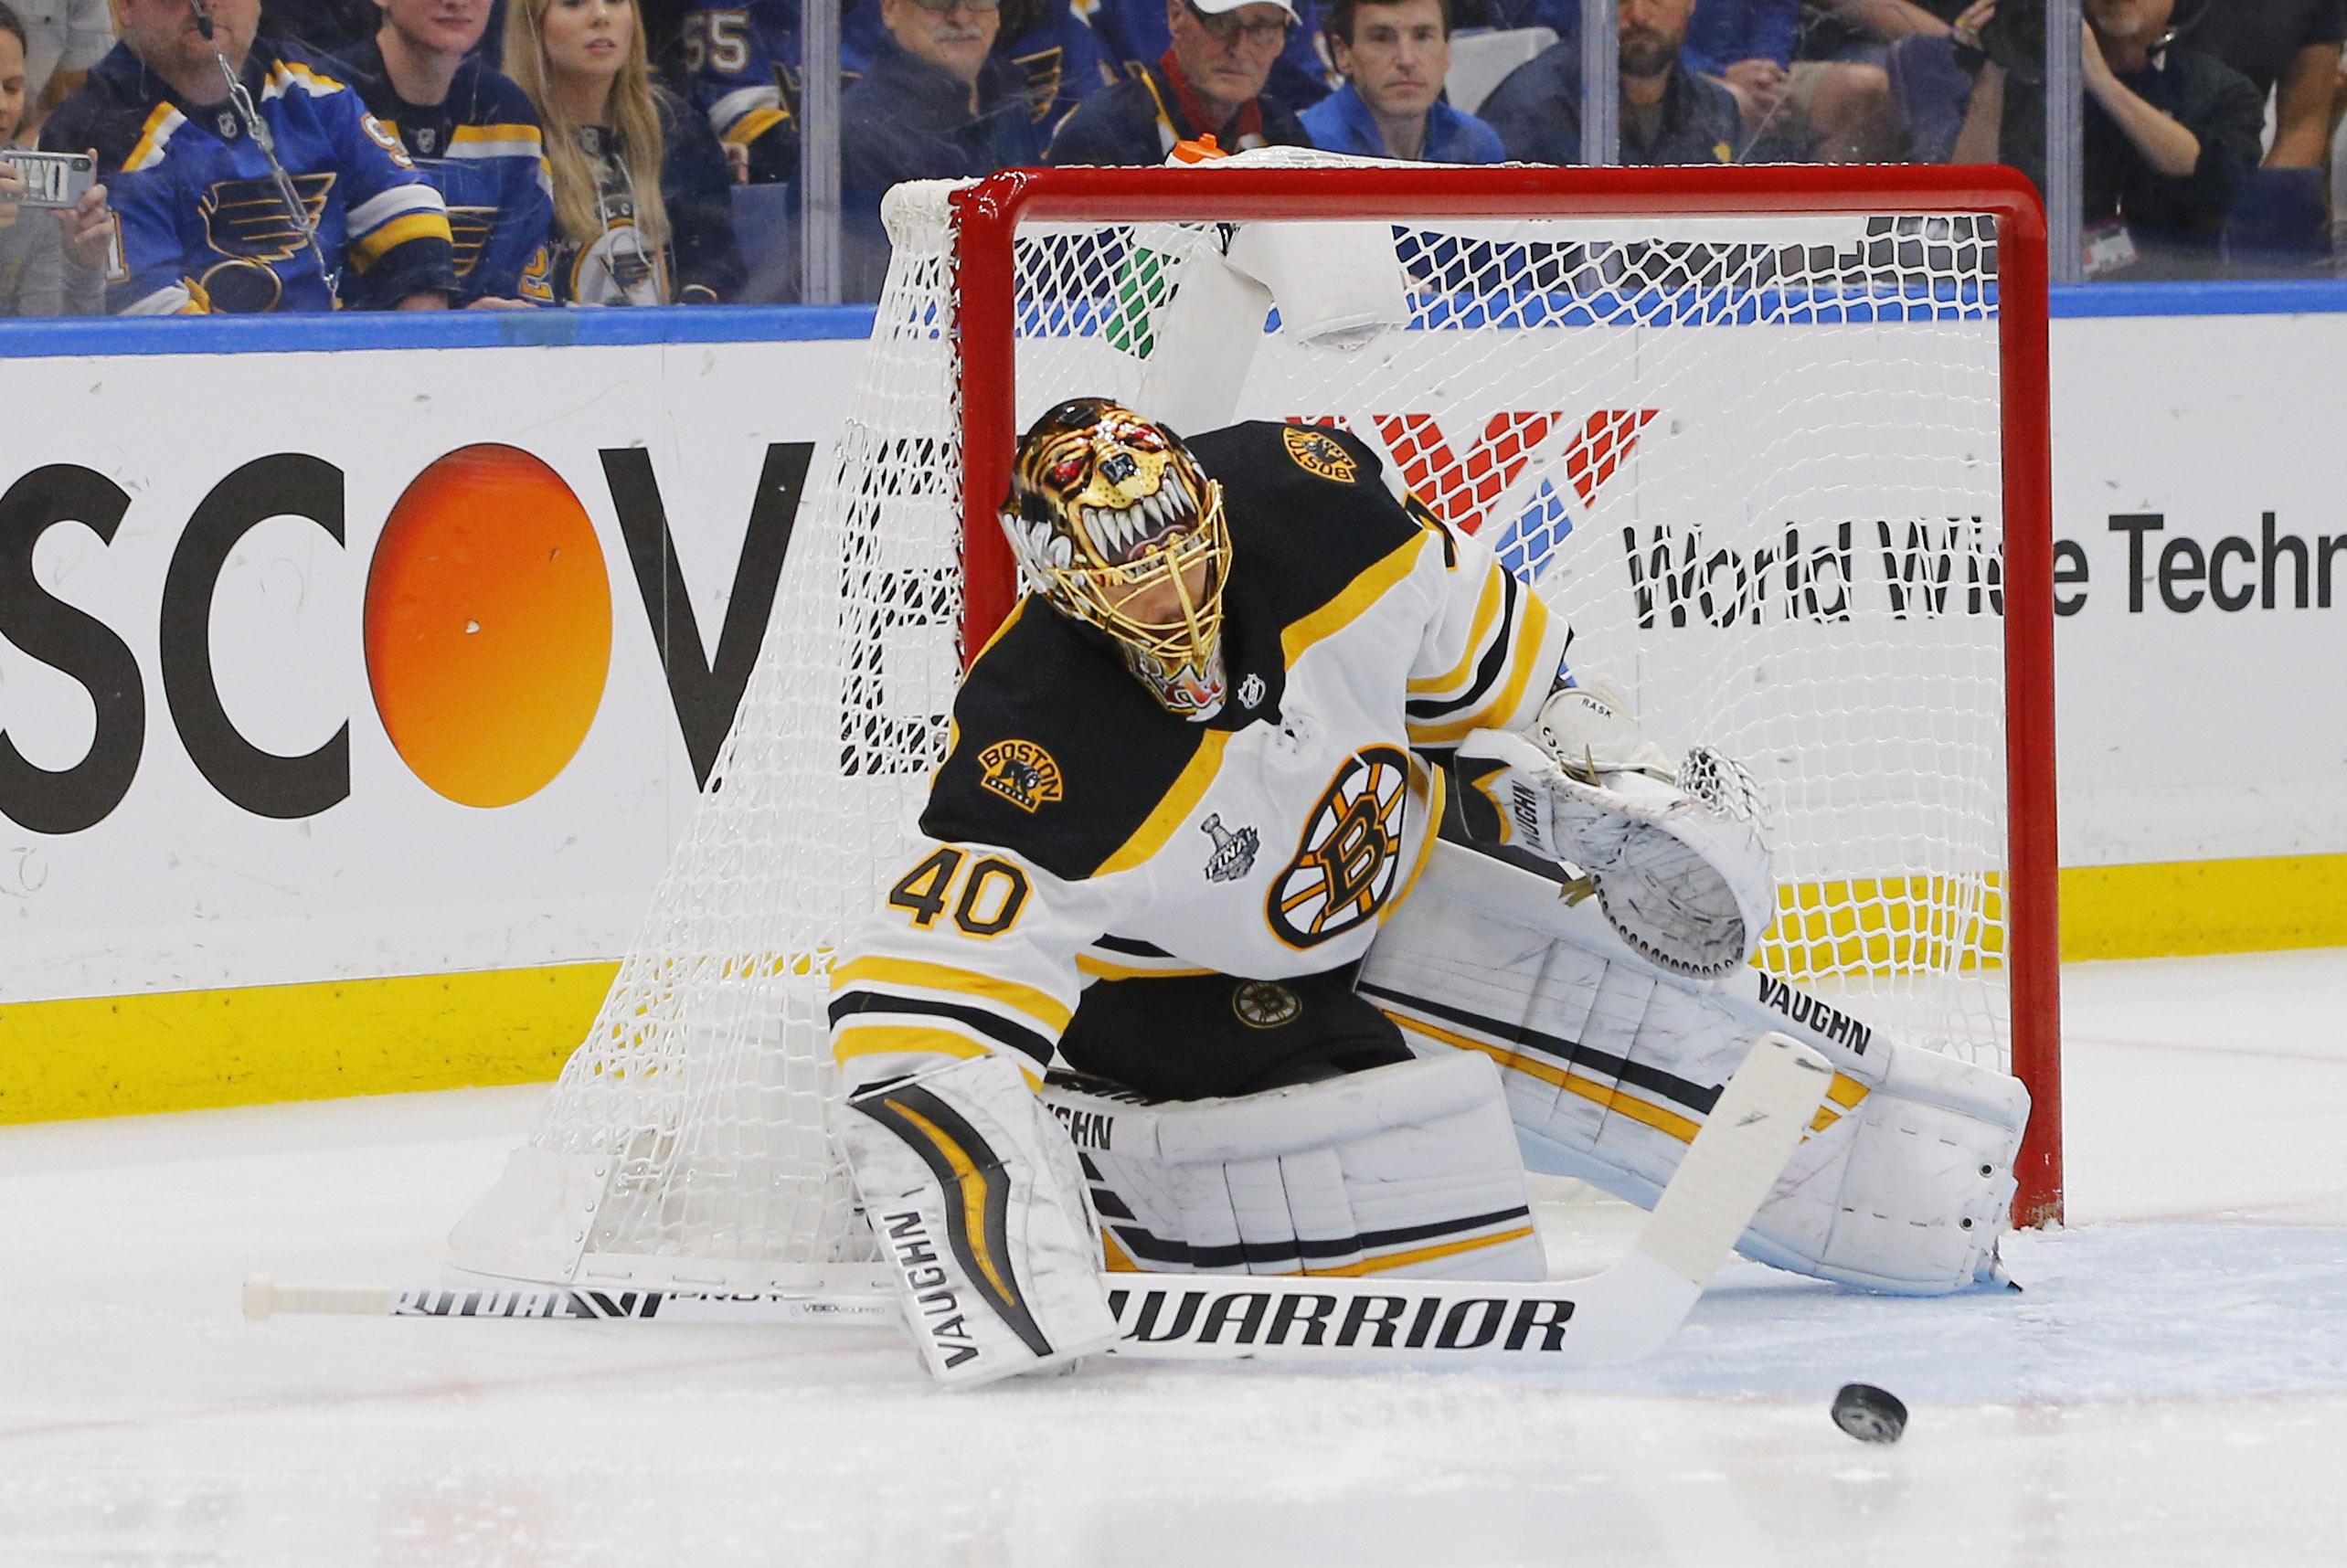 Tuukka Rask records 51st NHL shutout